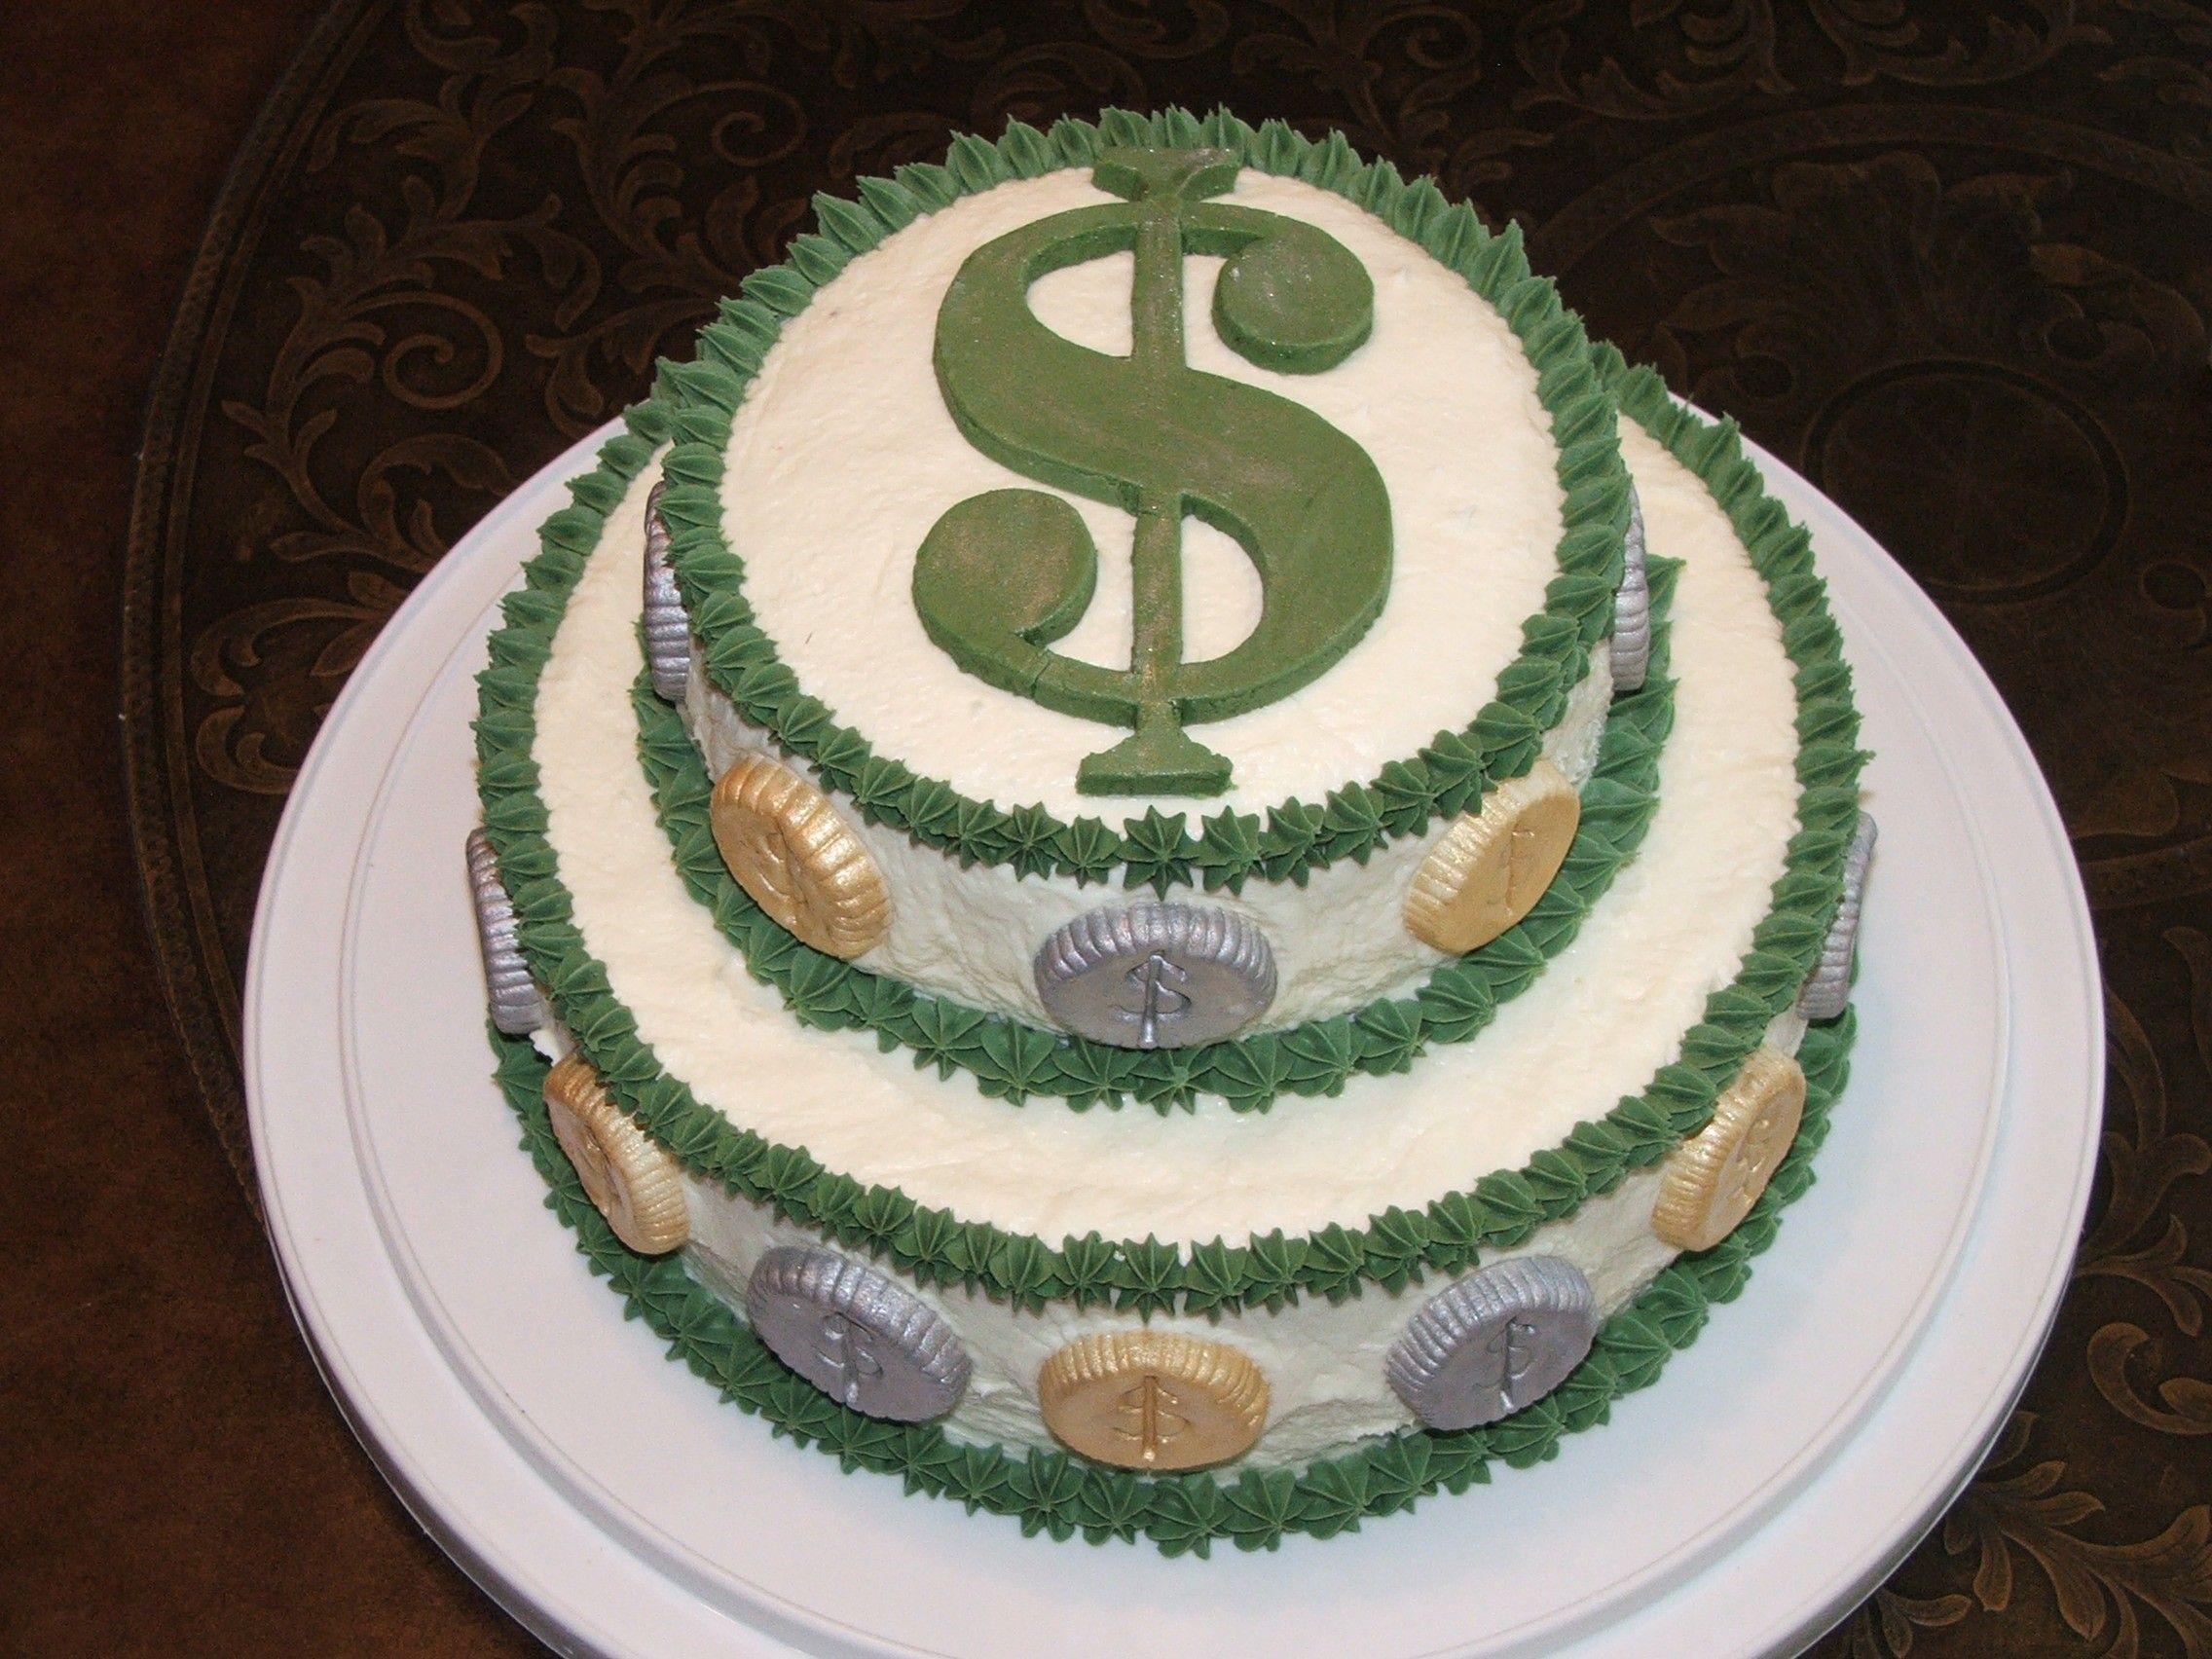 Birthday Cake With Money Inside